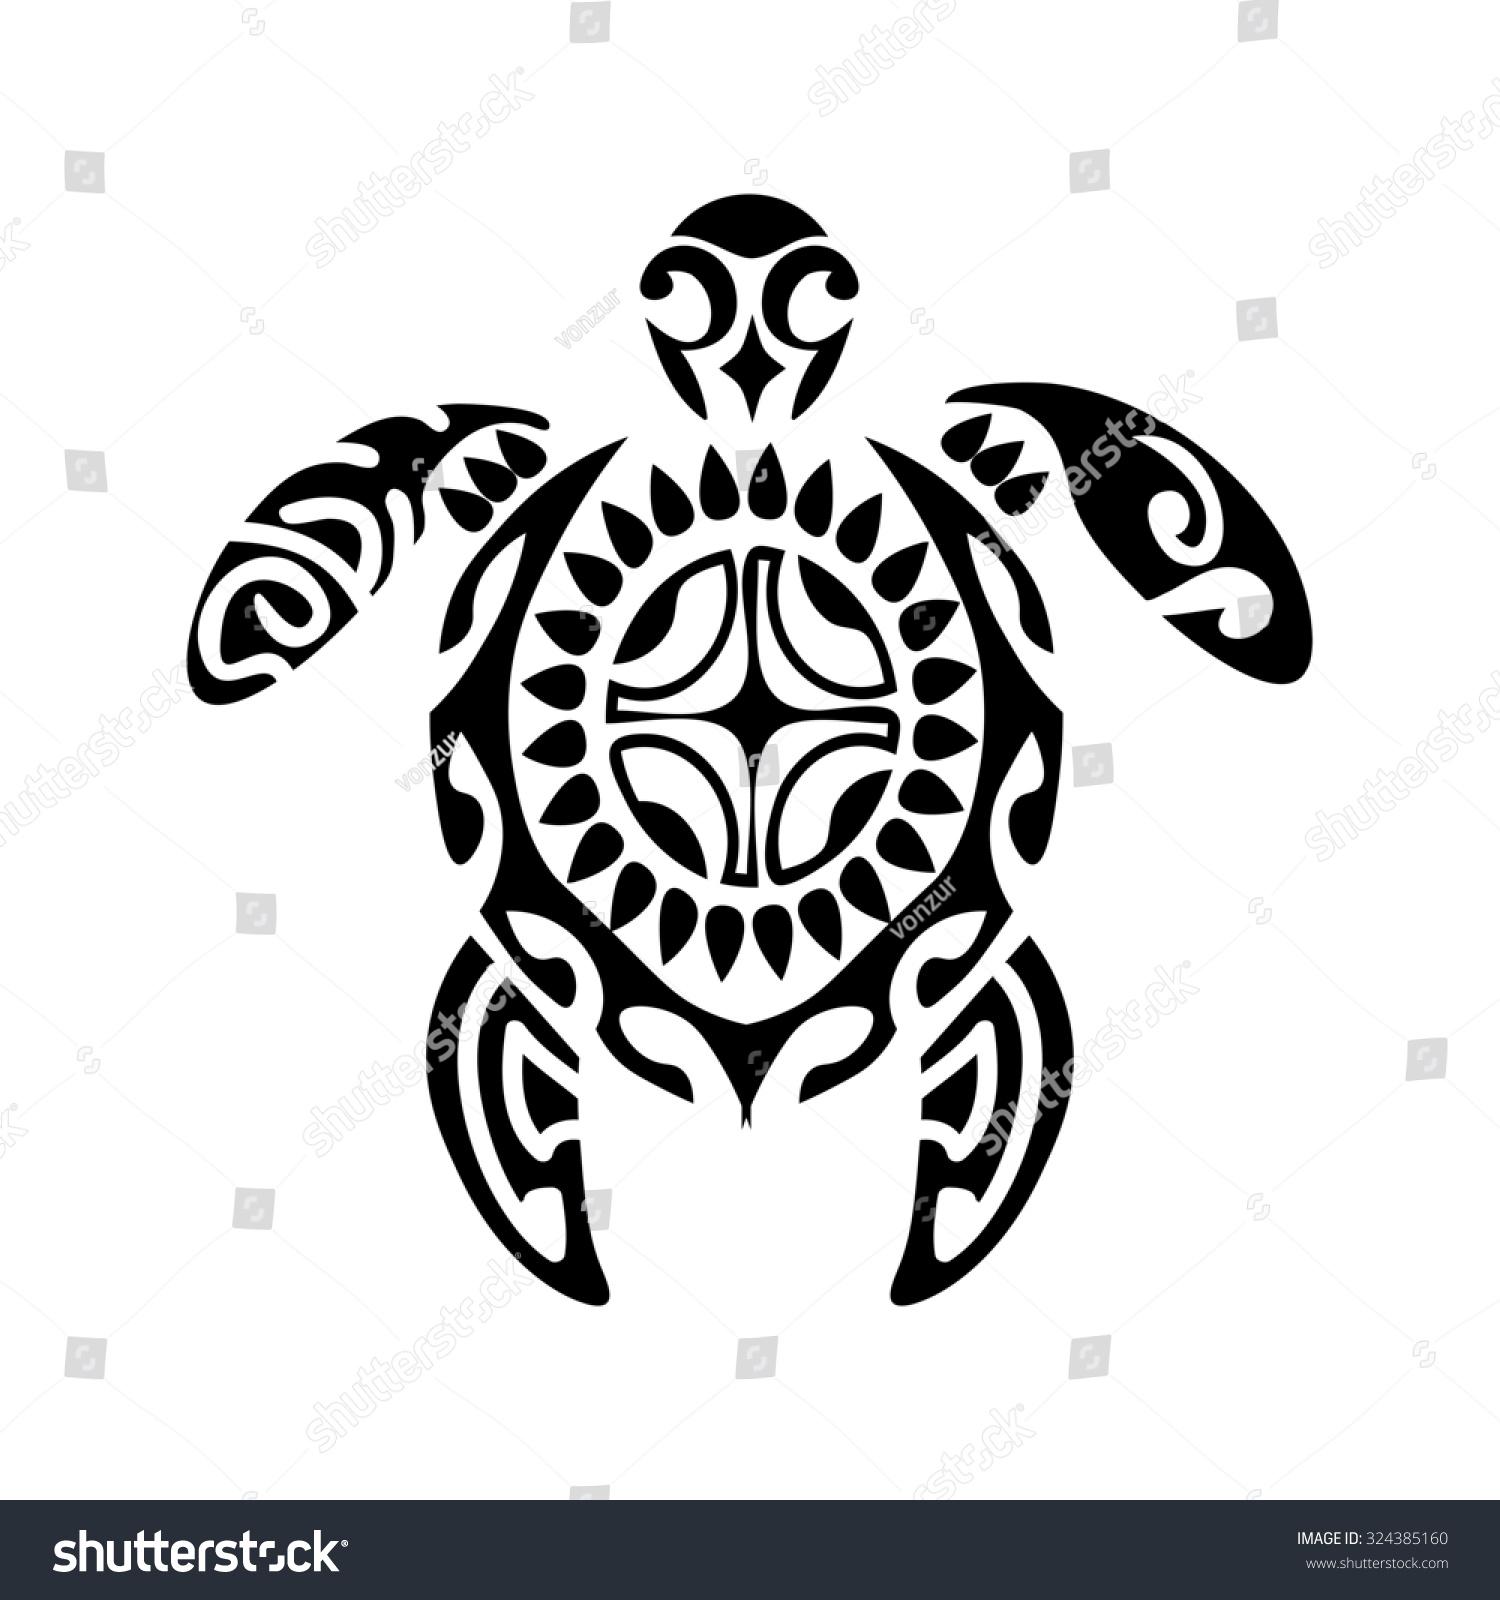 Maori Tattoo Design Stock Photos: Use To Design And Tattoo. Maori